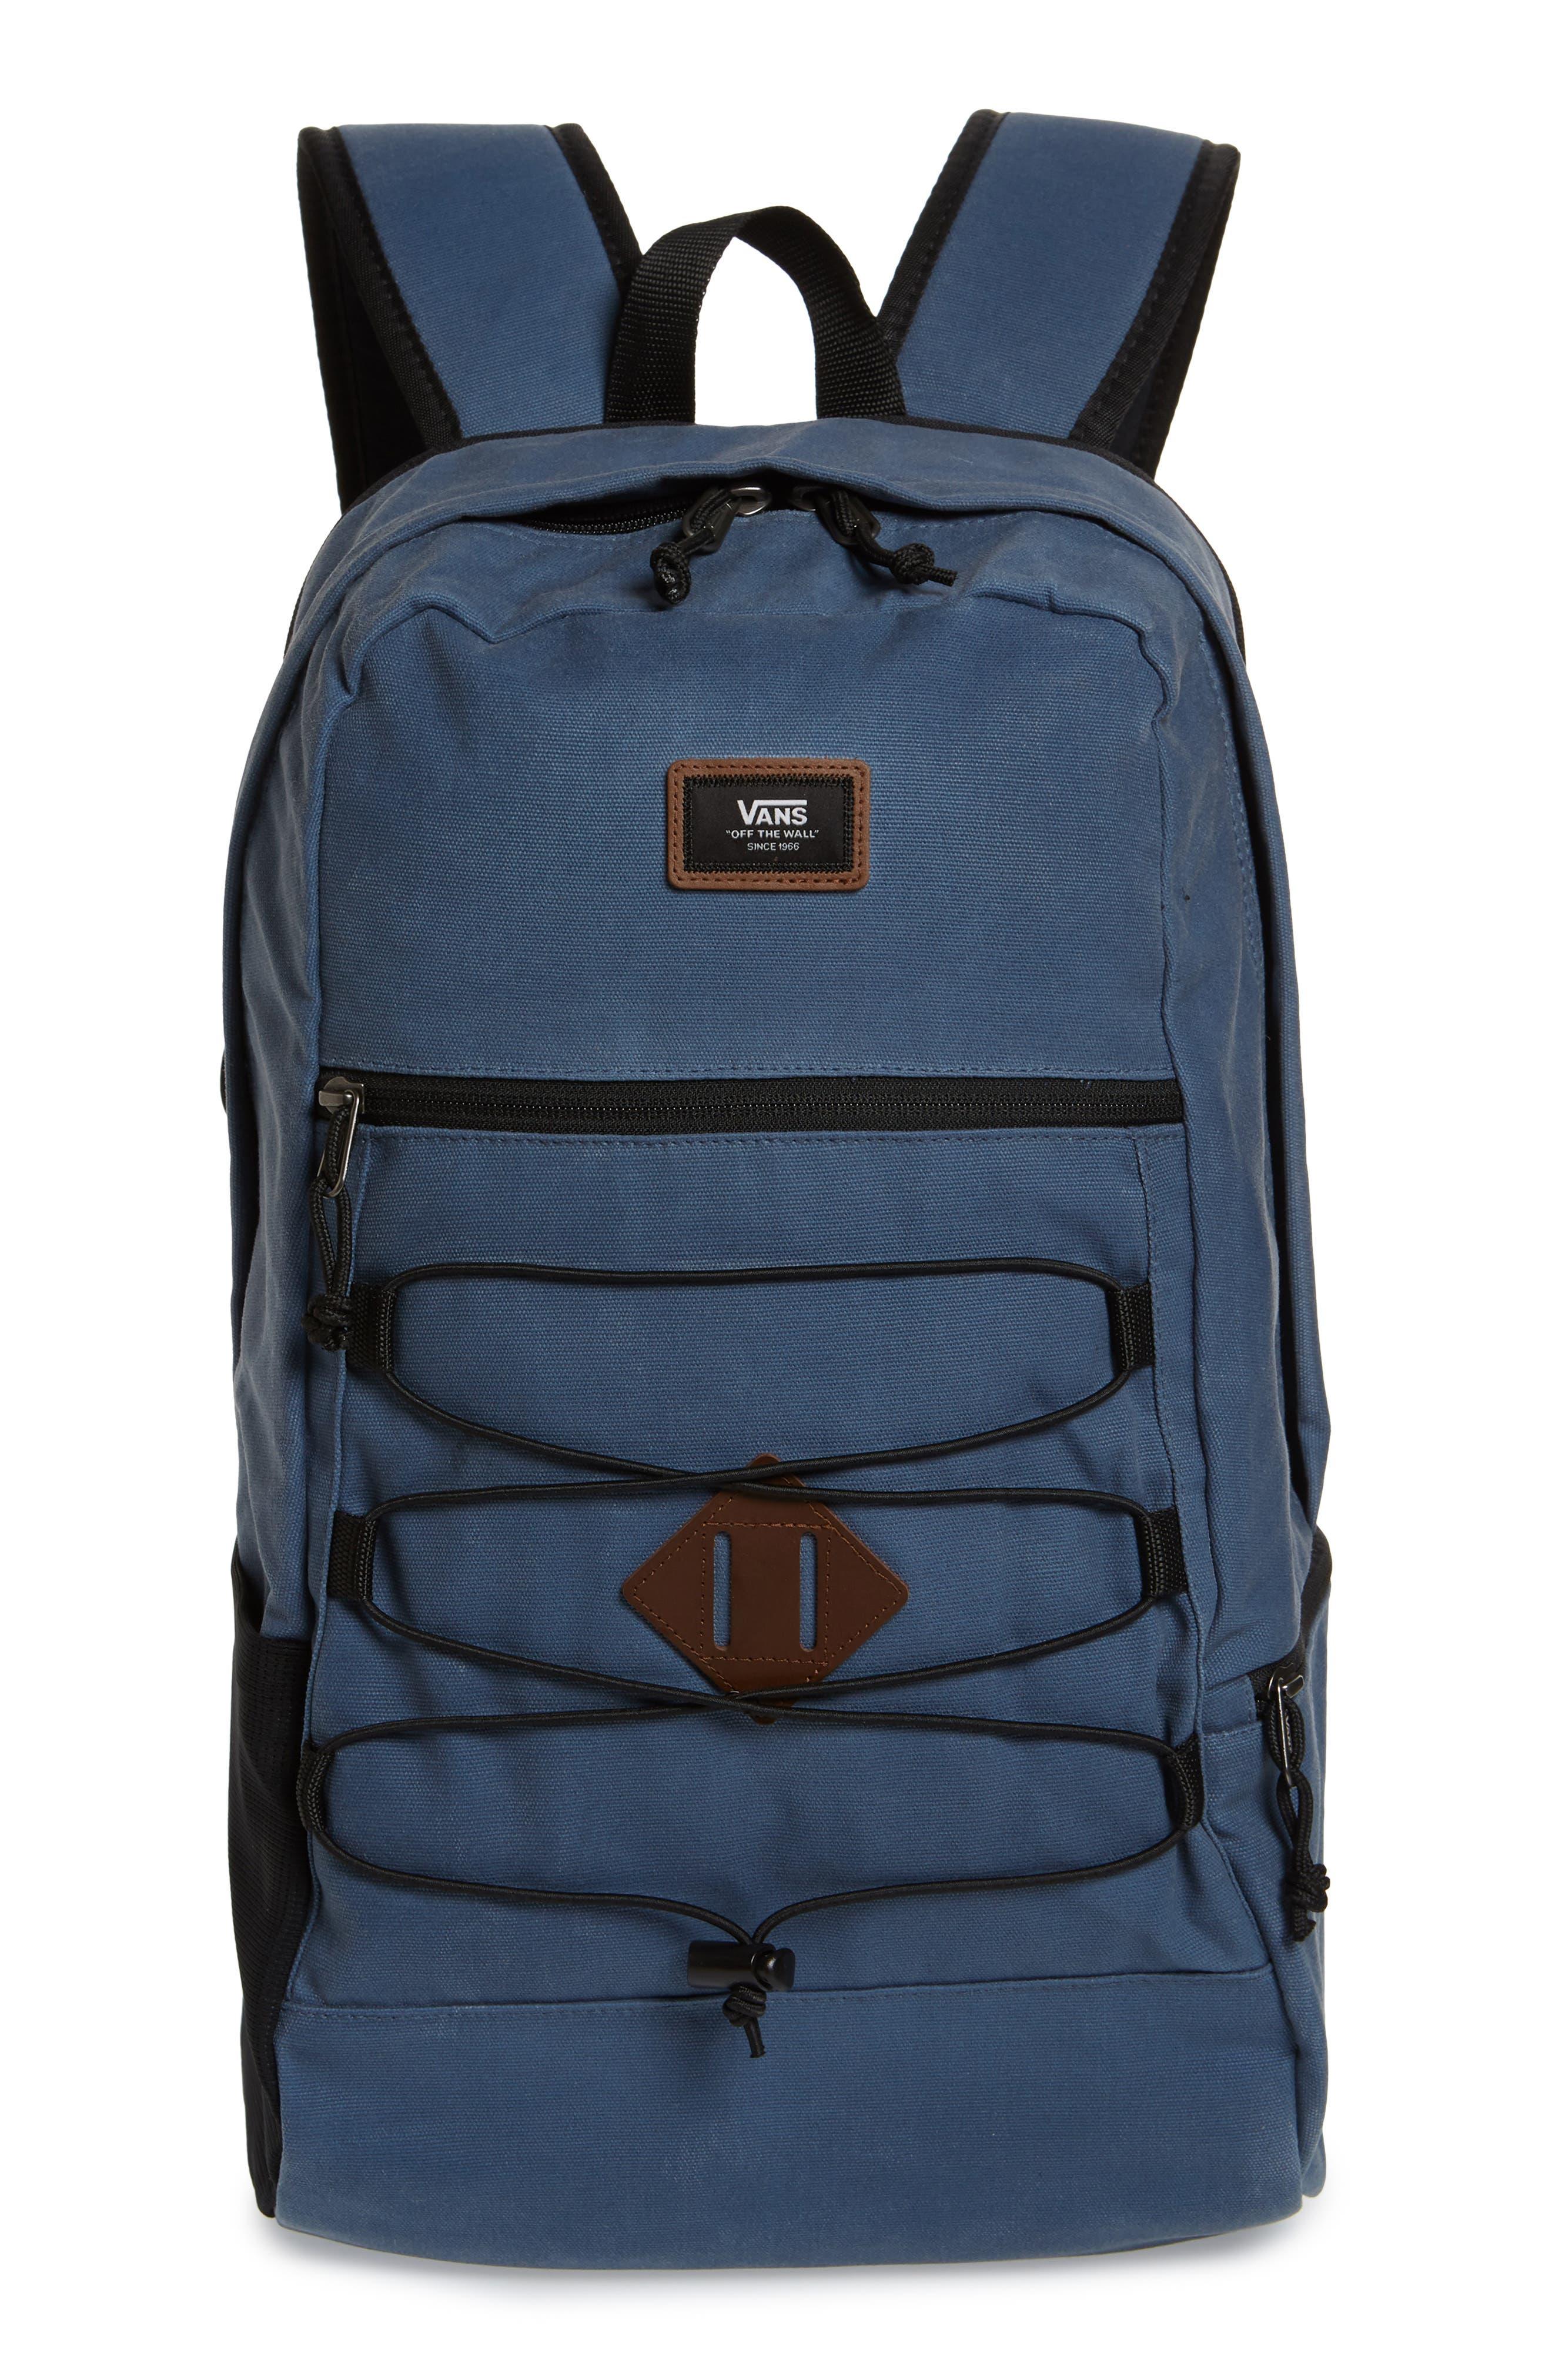 Vans Snag Plus Backpack - Blue